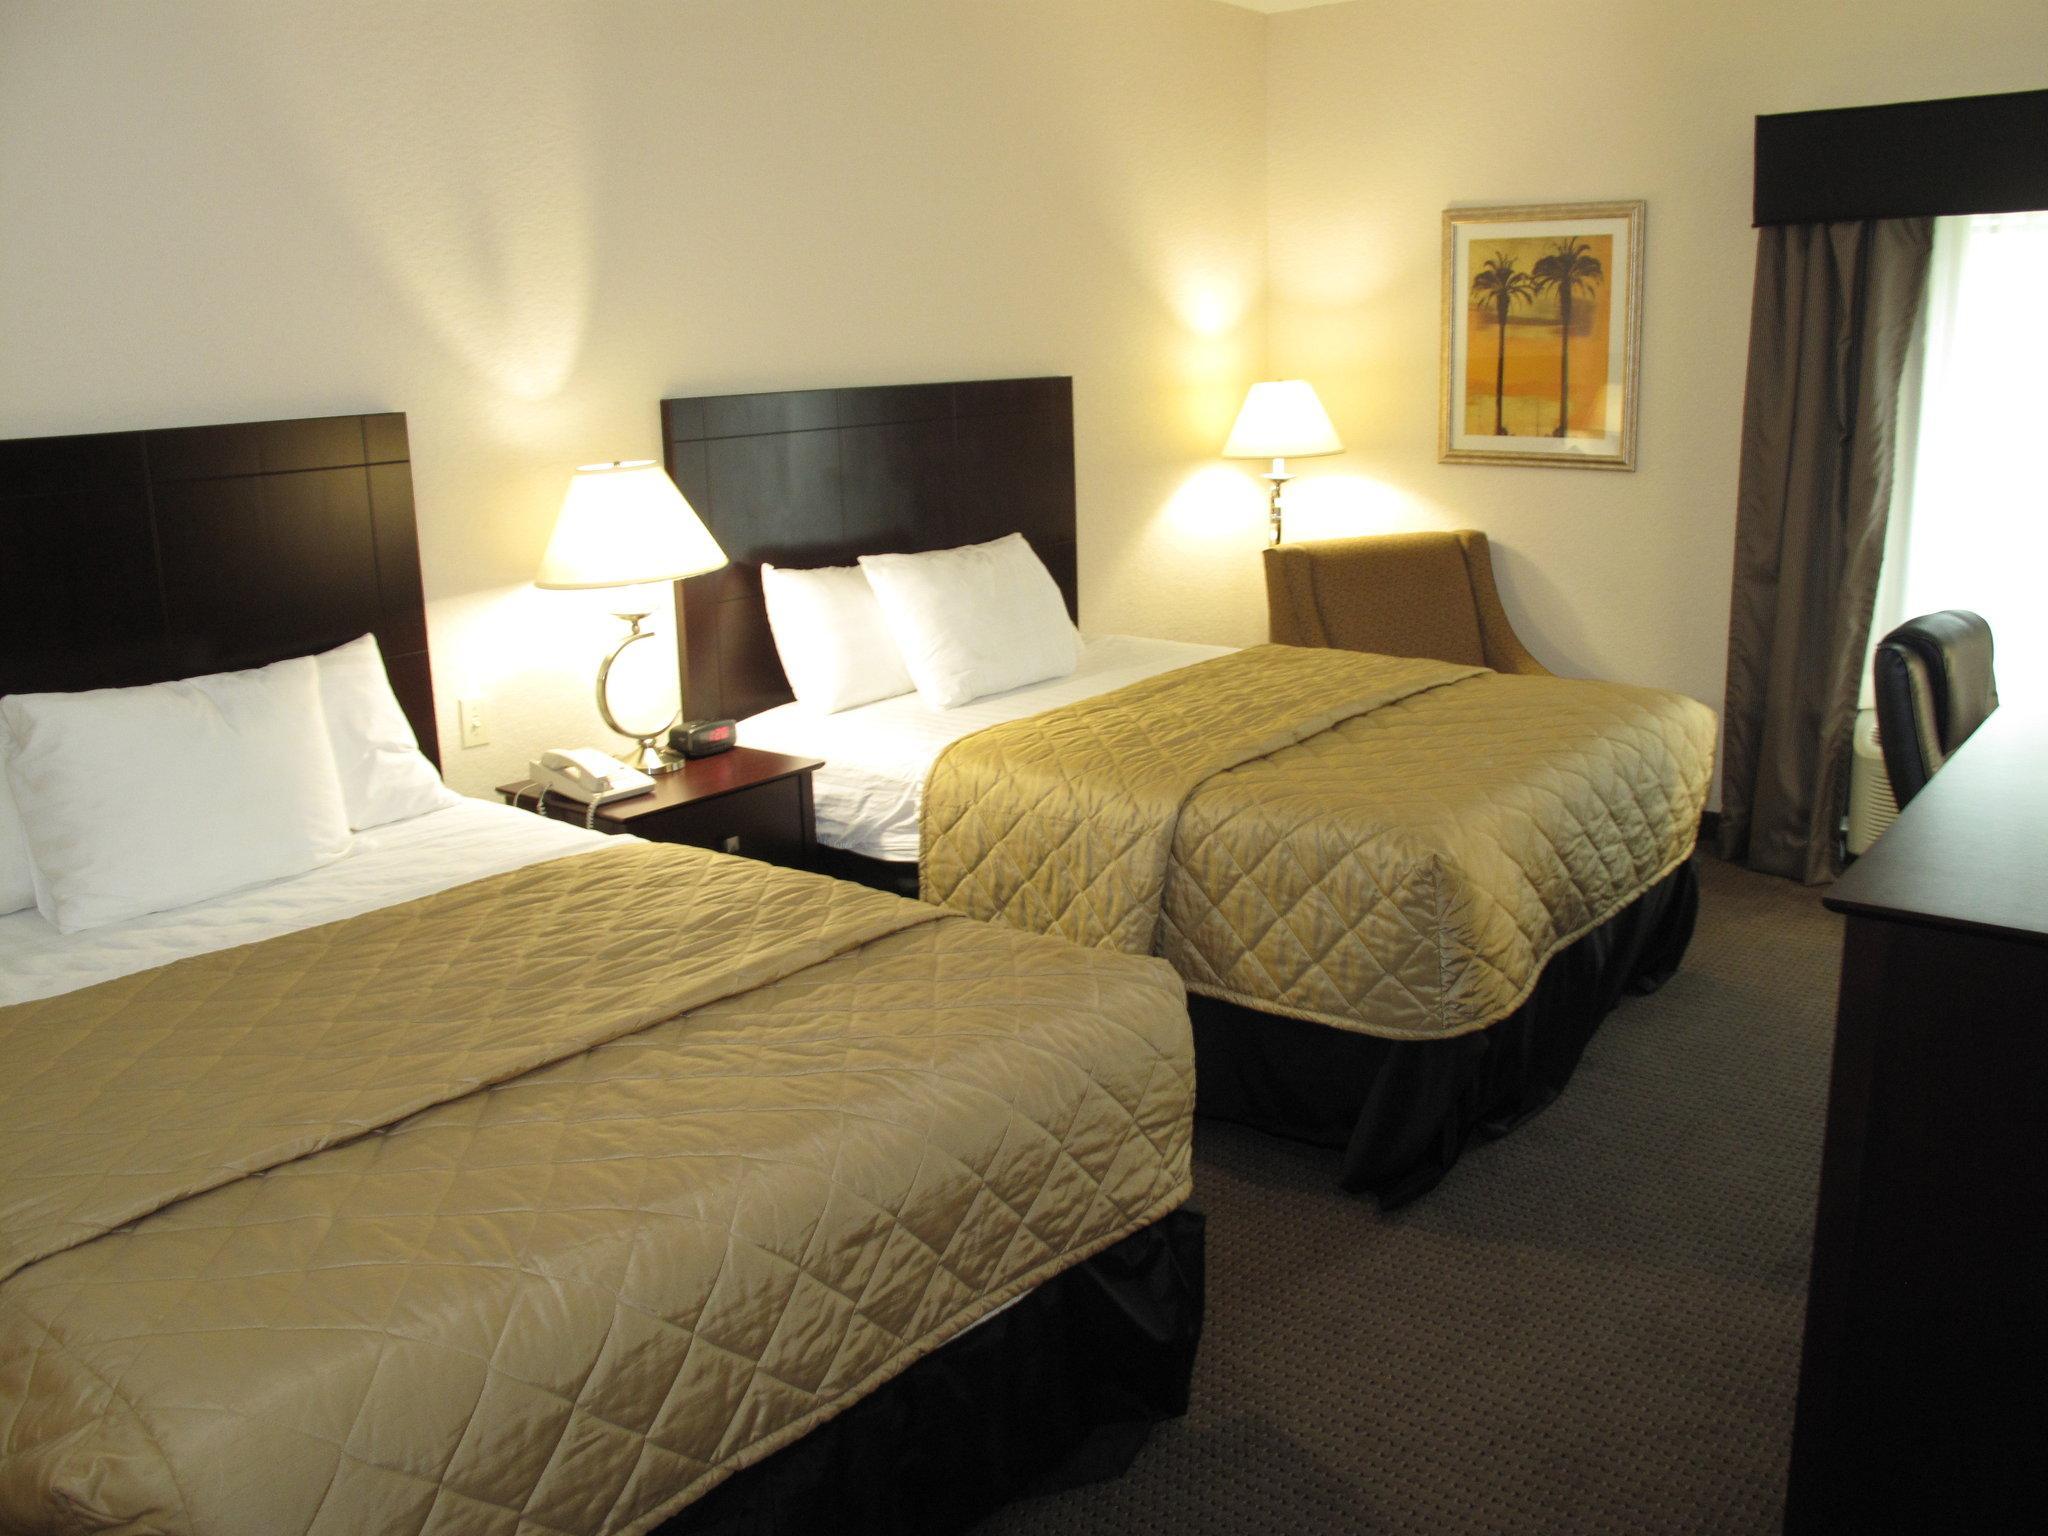 La Quinta Inn & Suites Port Orange / Daytona